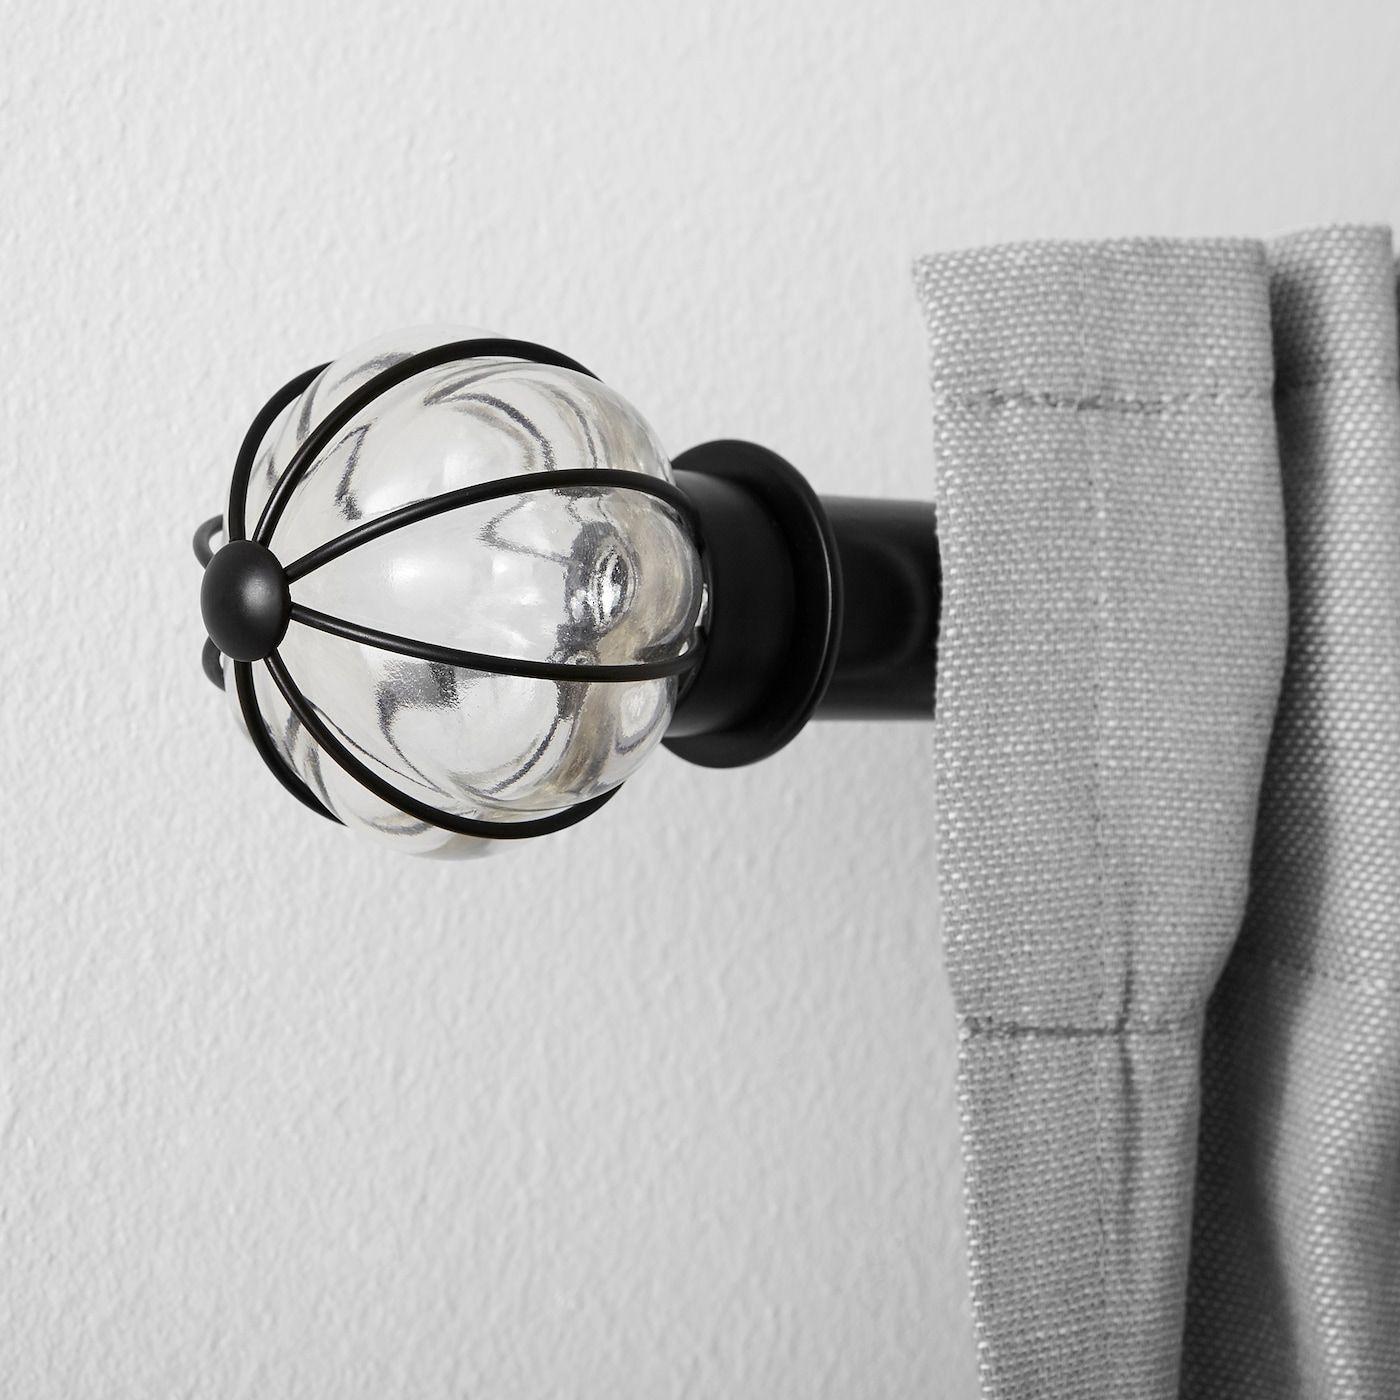 Blast Finials 1 Pair Black In 2020 Finials Curtain Rods Ikea